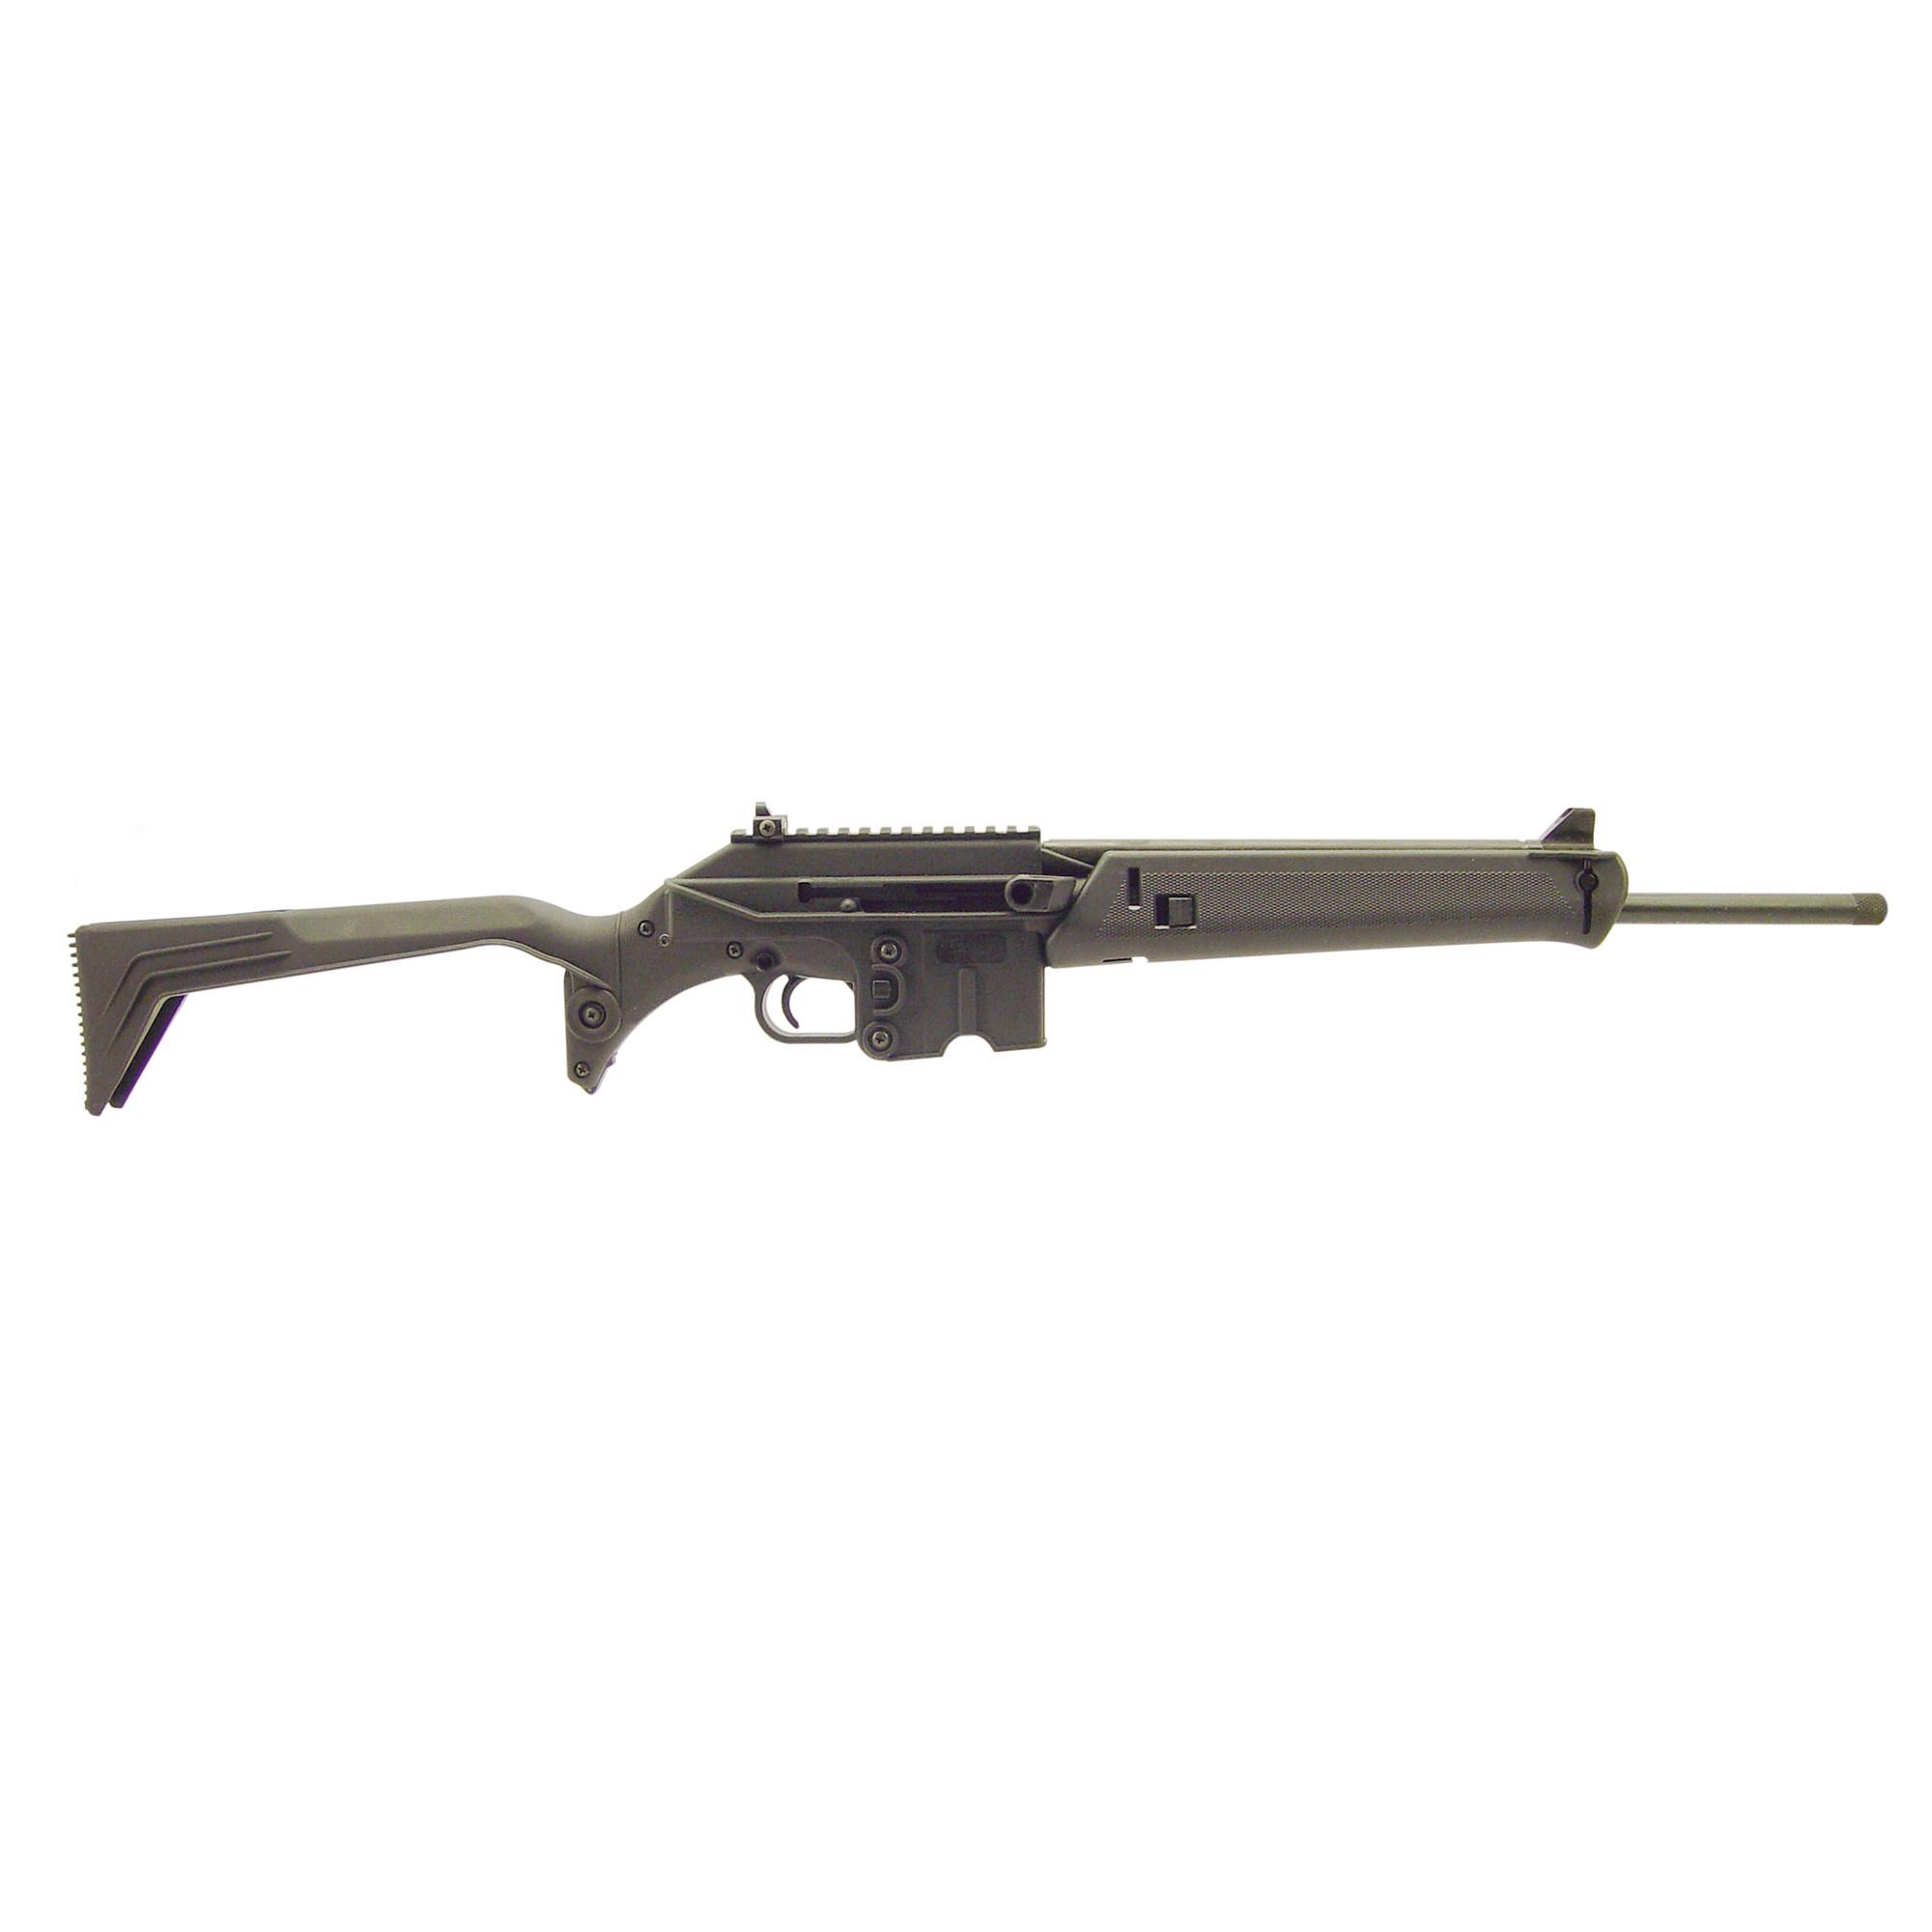 "Kel-Tec Kel-Tec SU16C SUB-16 Sport Utility Carbine SA 223 Rem 16"" 10+1 Fldng Syn Stk Blk"